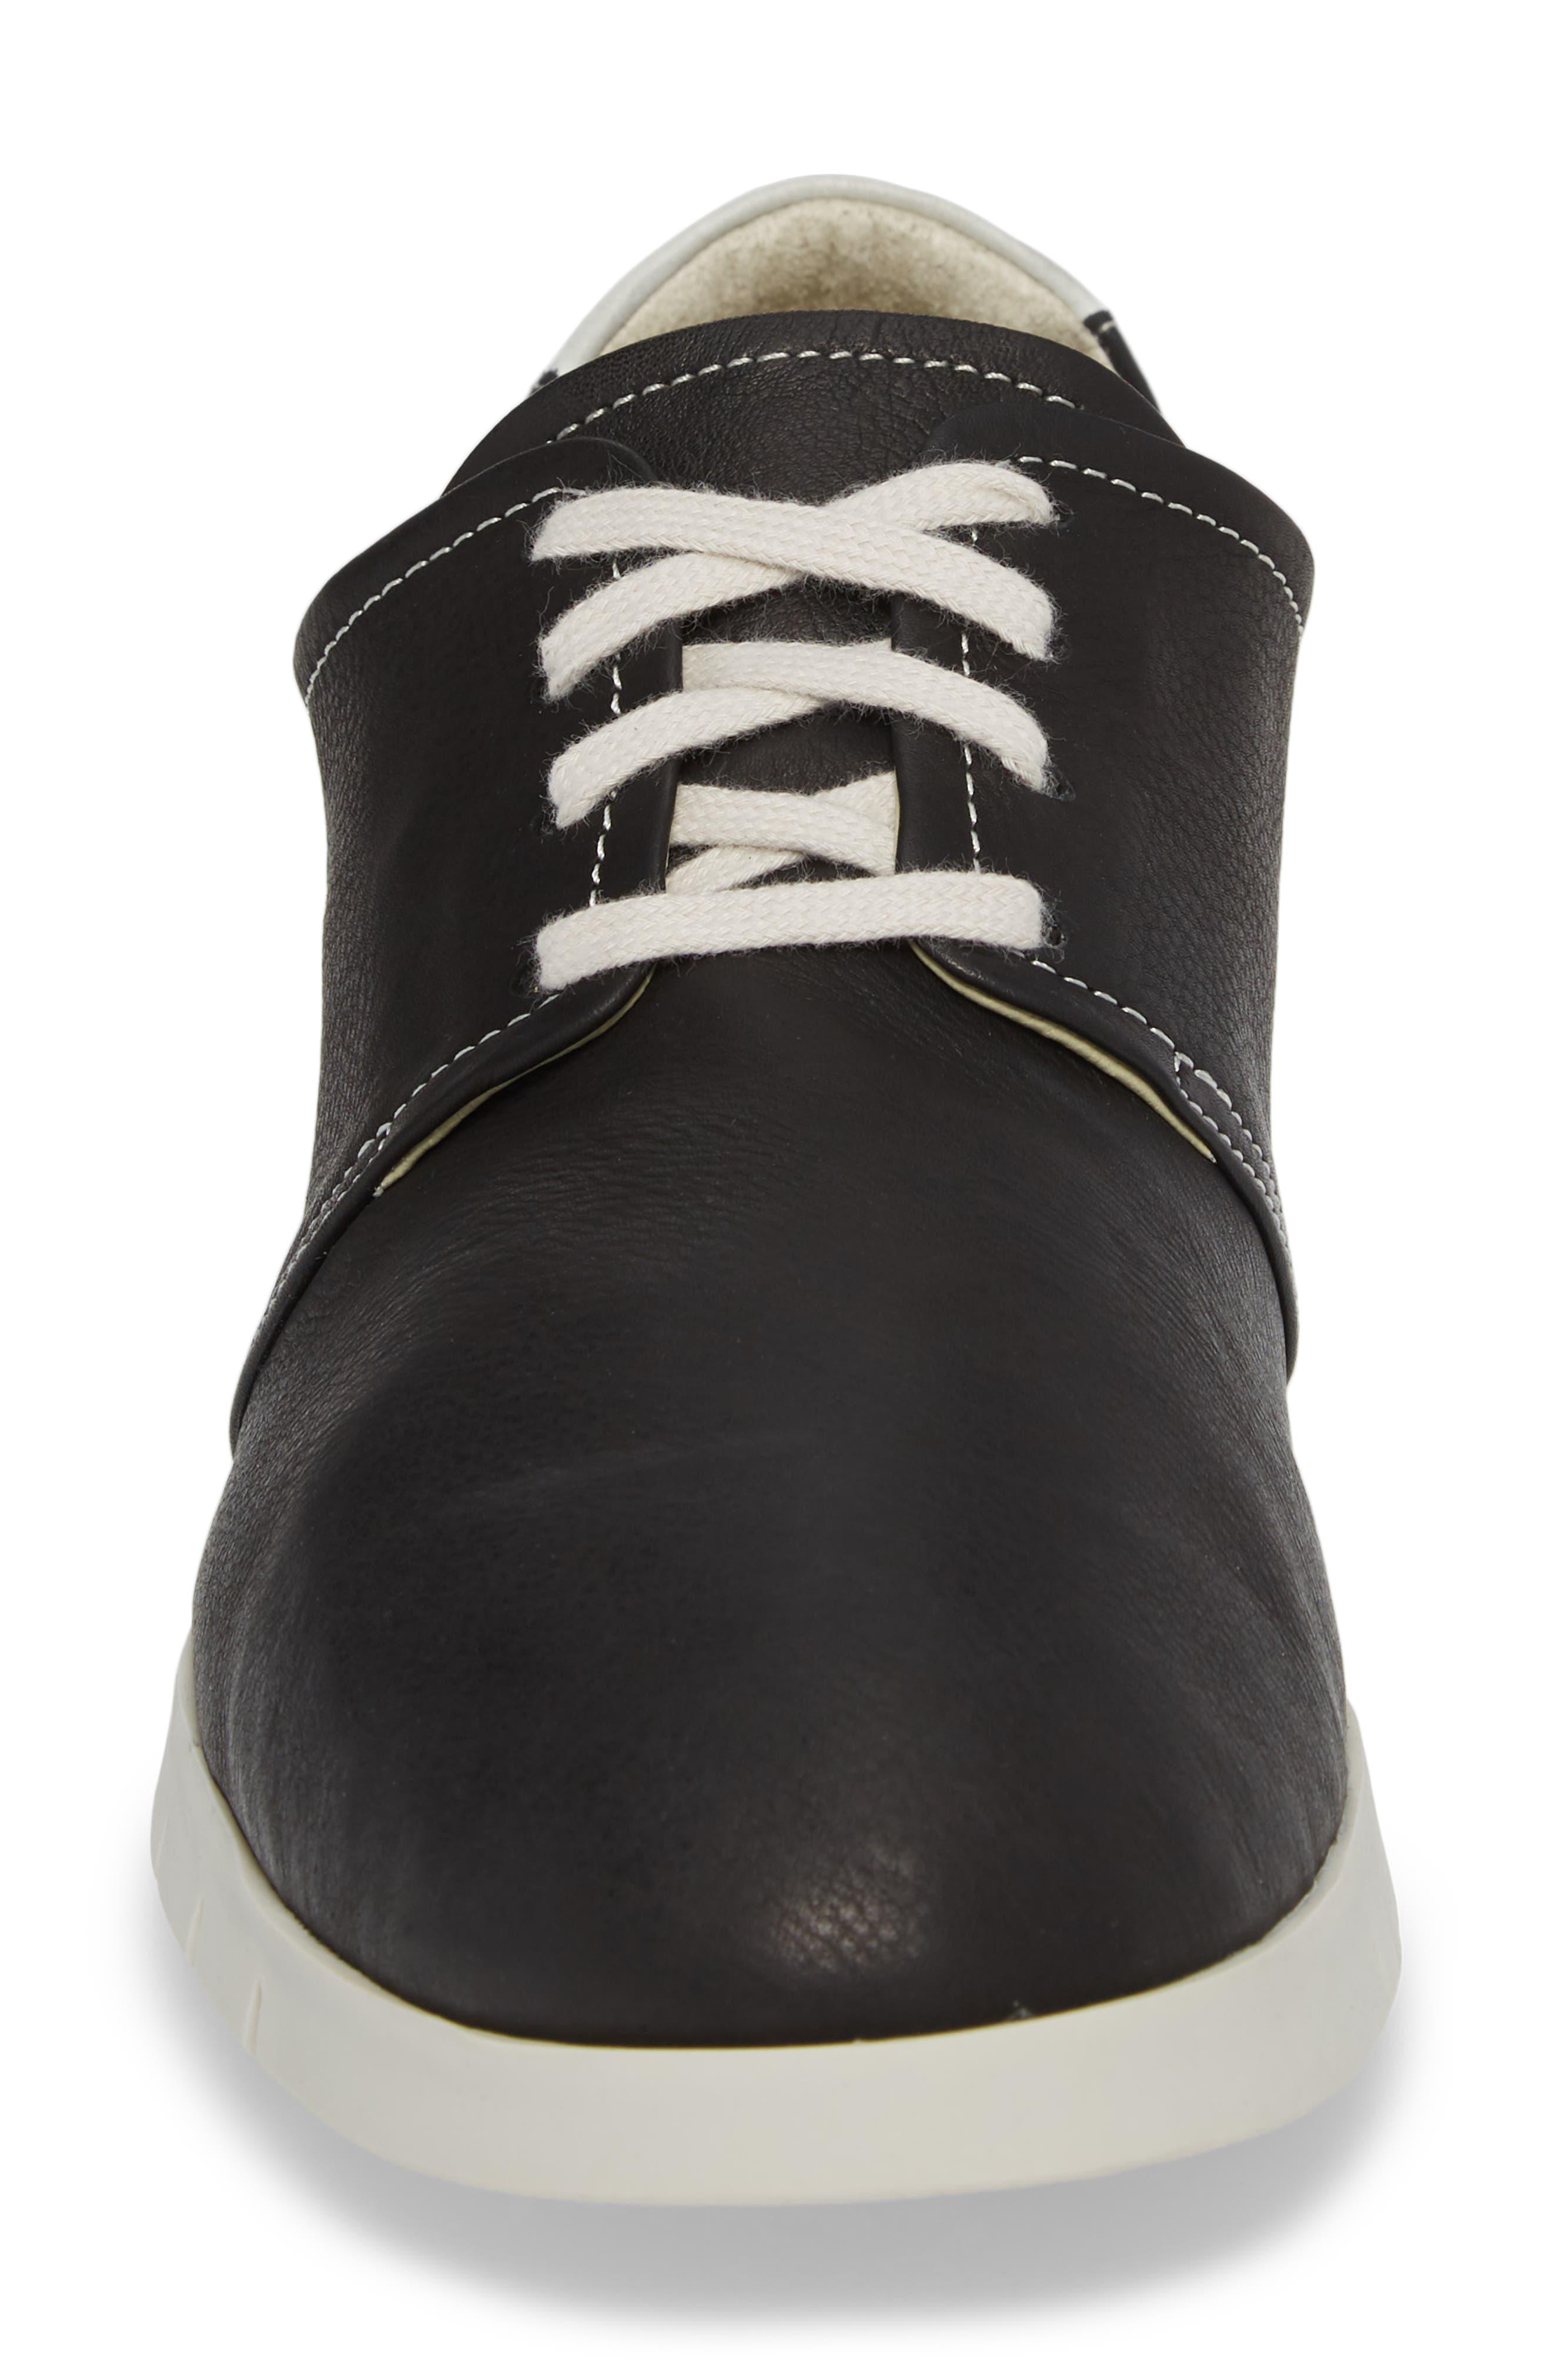 Alternate Image 4  - Softinos by Fly London Cap Low Top Sneaker (Men)